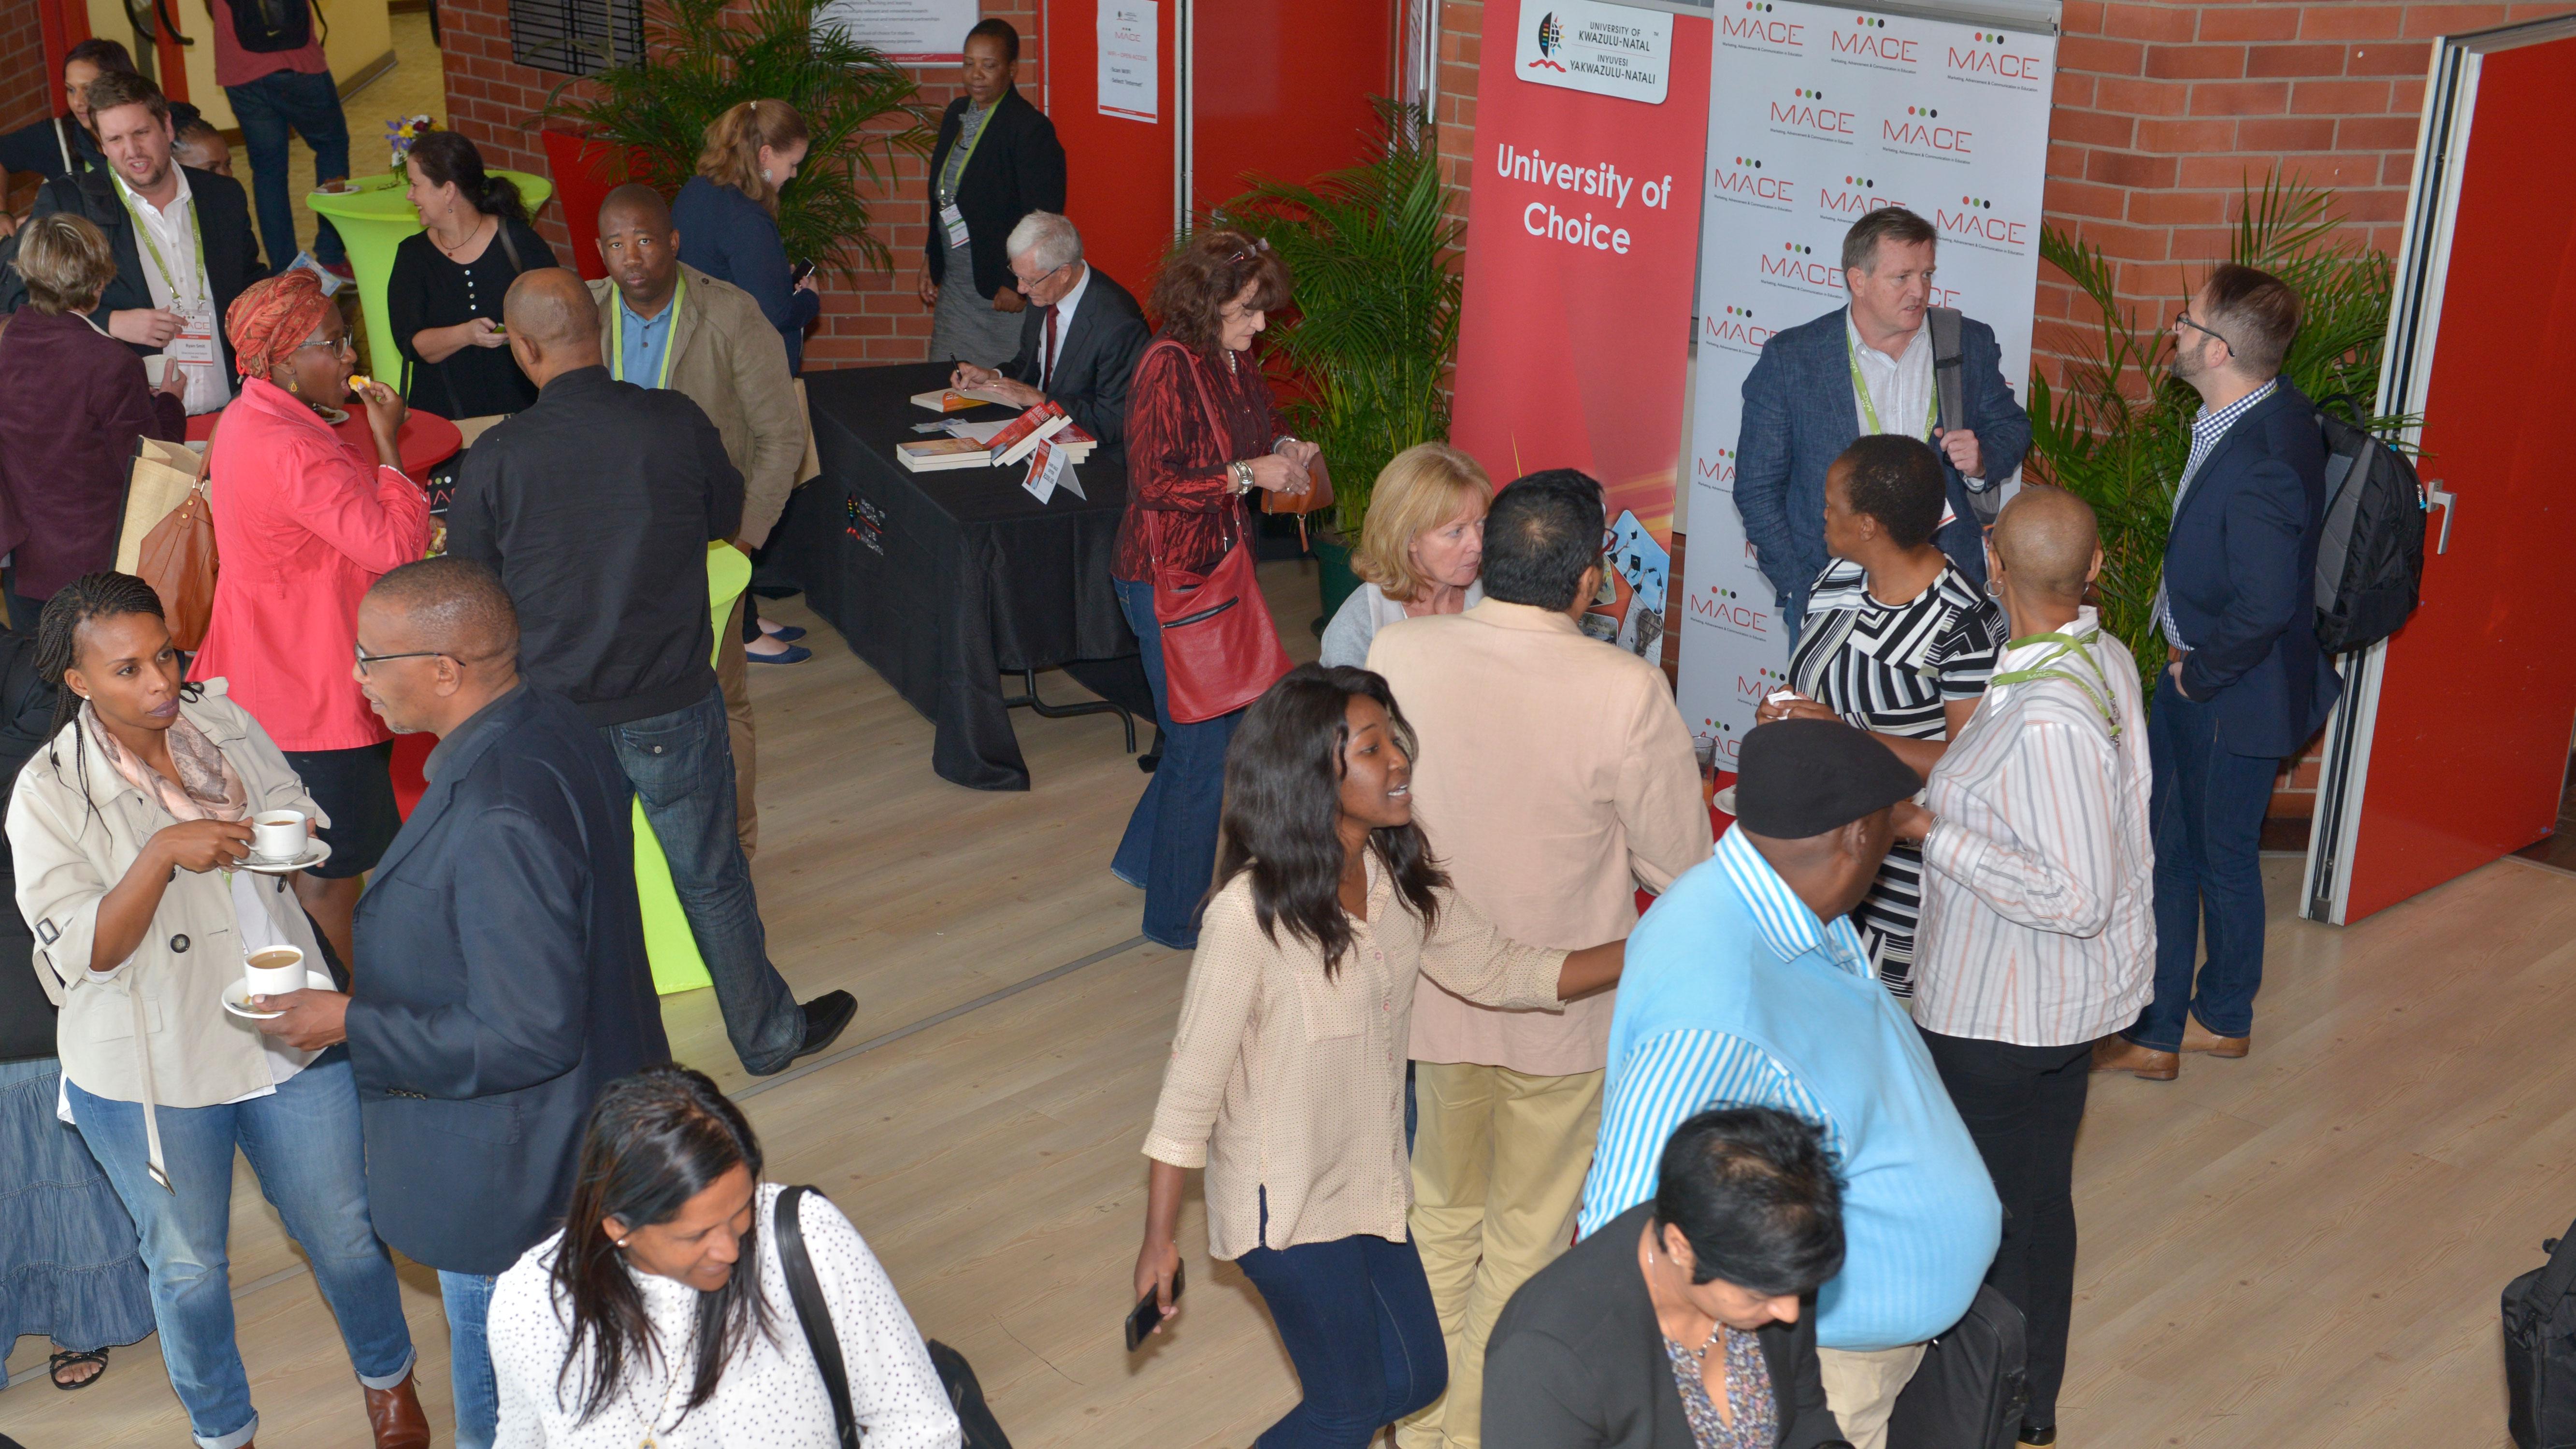 http://mace.org.za/wp-content/uploads/2015/12/symposium2017_5.jpg